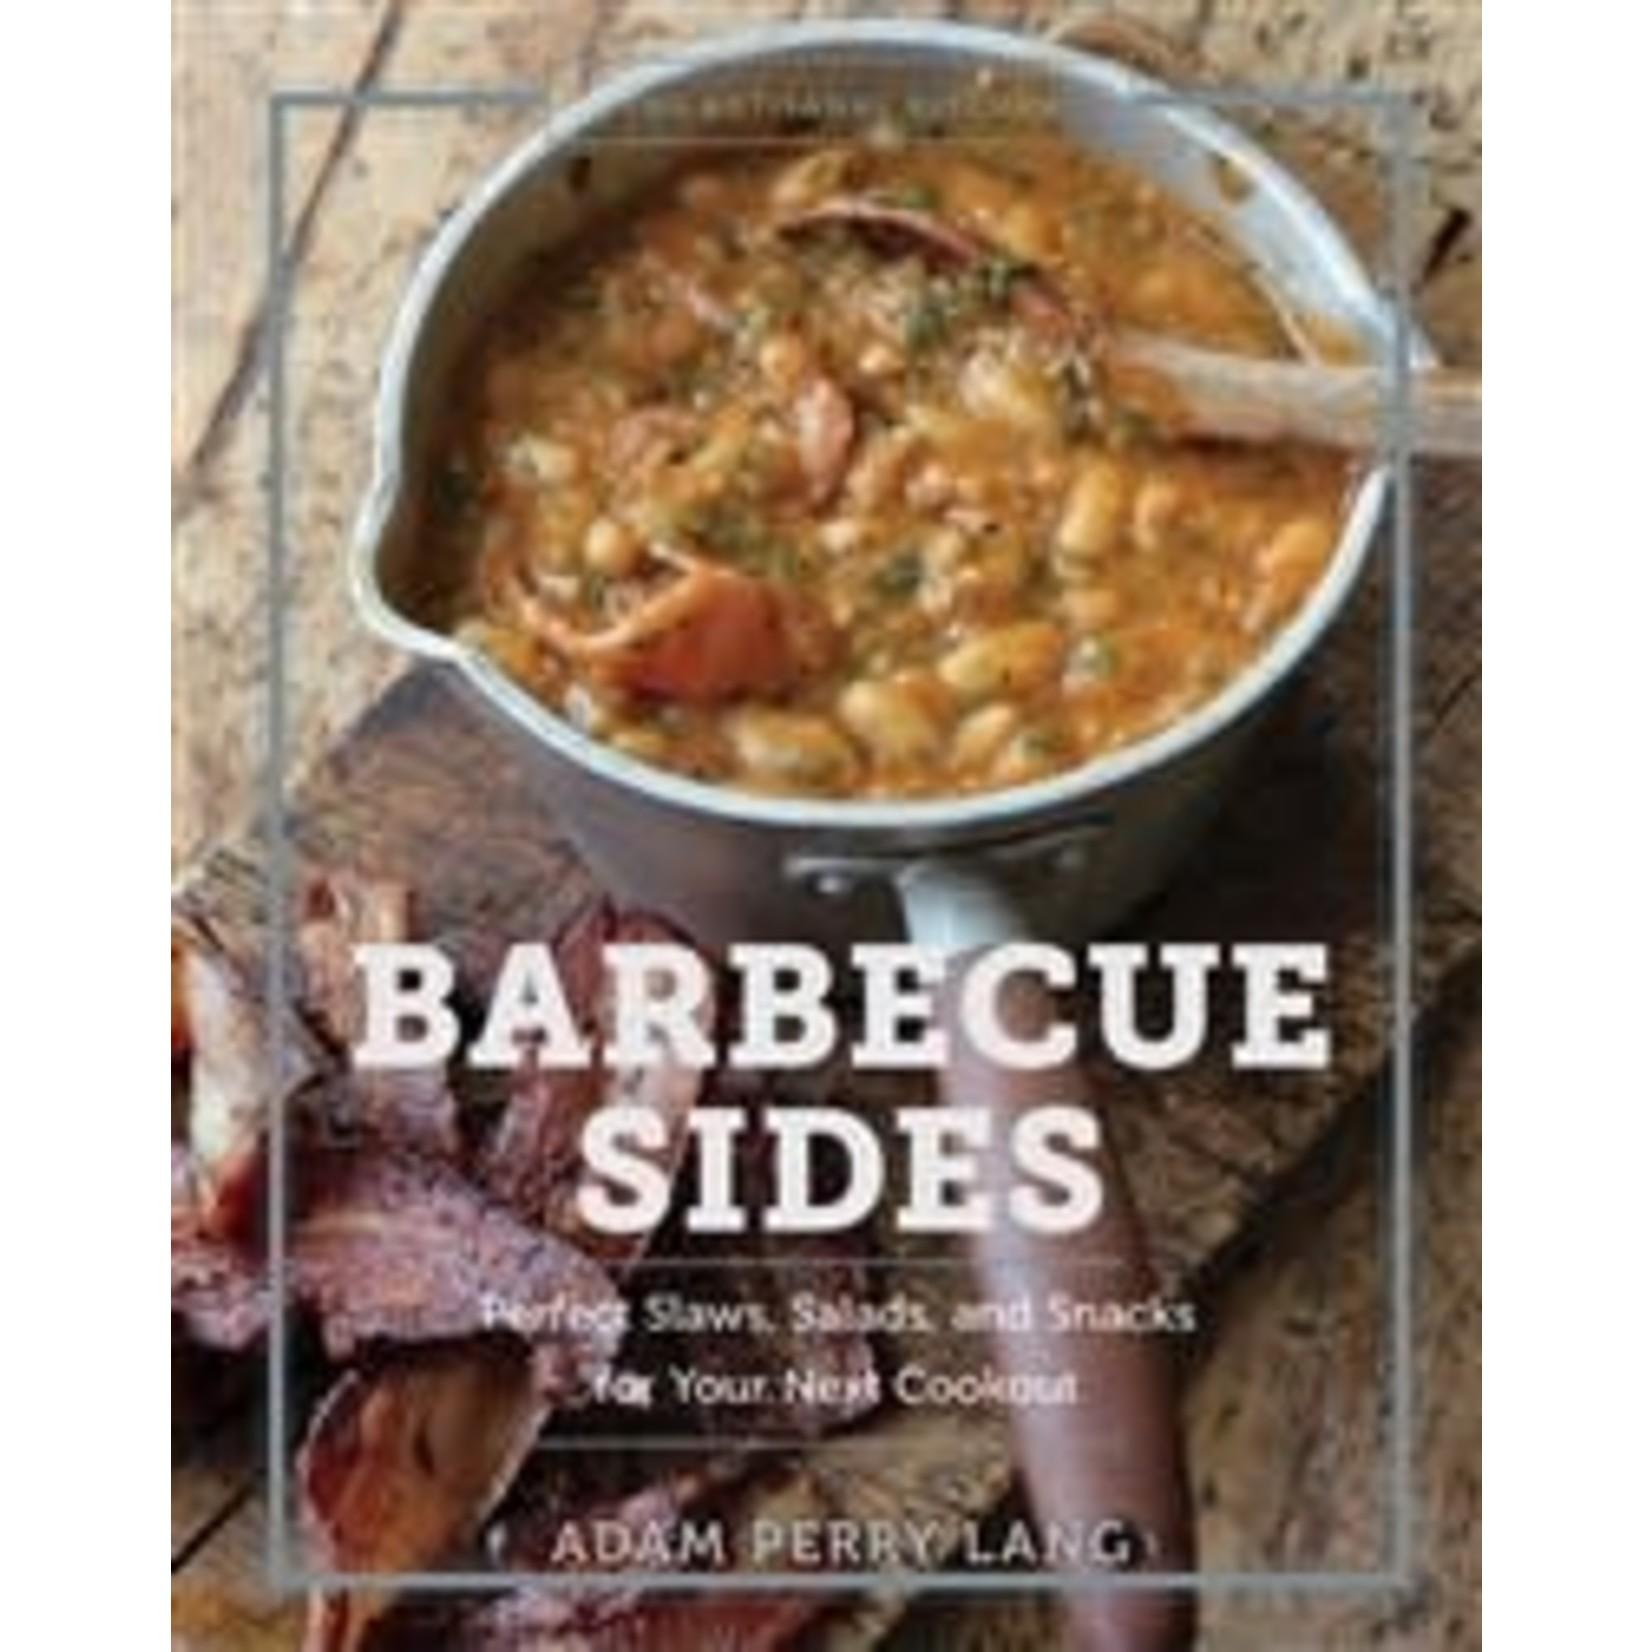 Artisanal Kitchen: Barbecue Sides